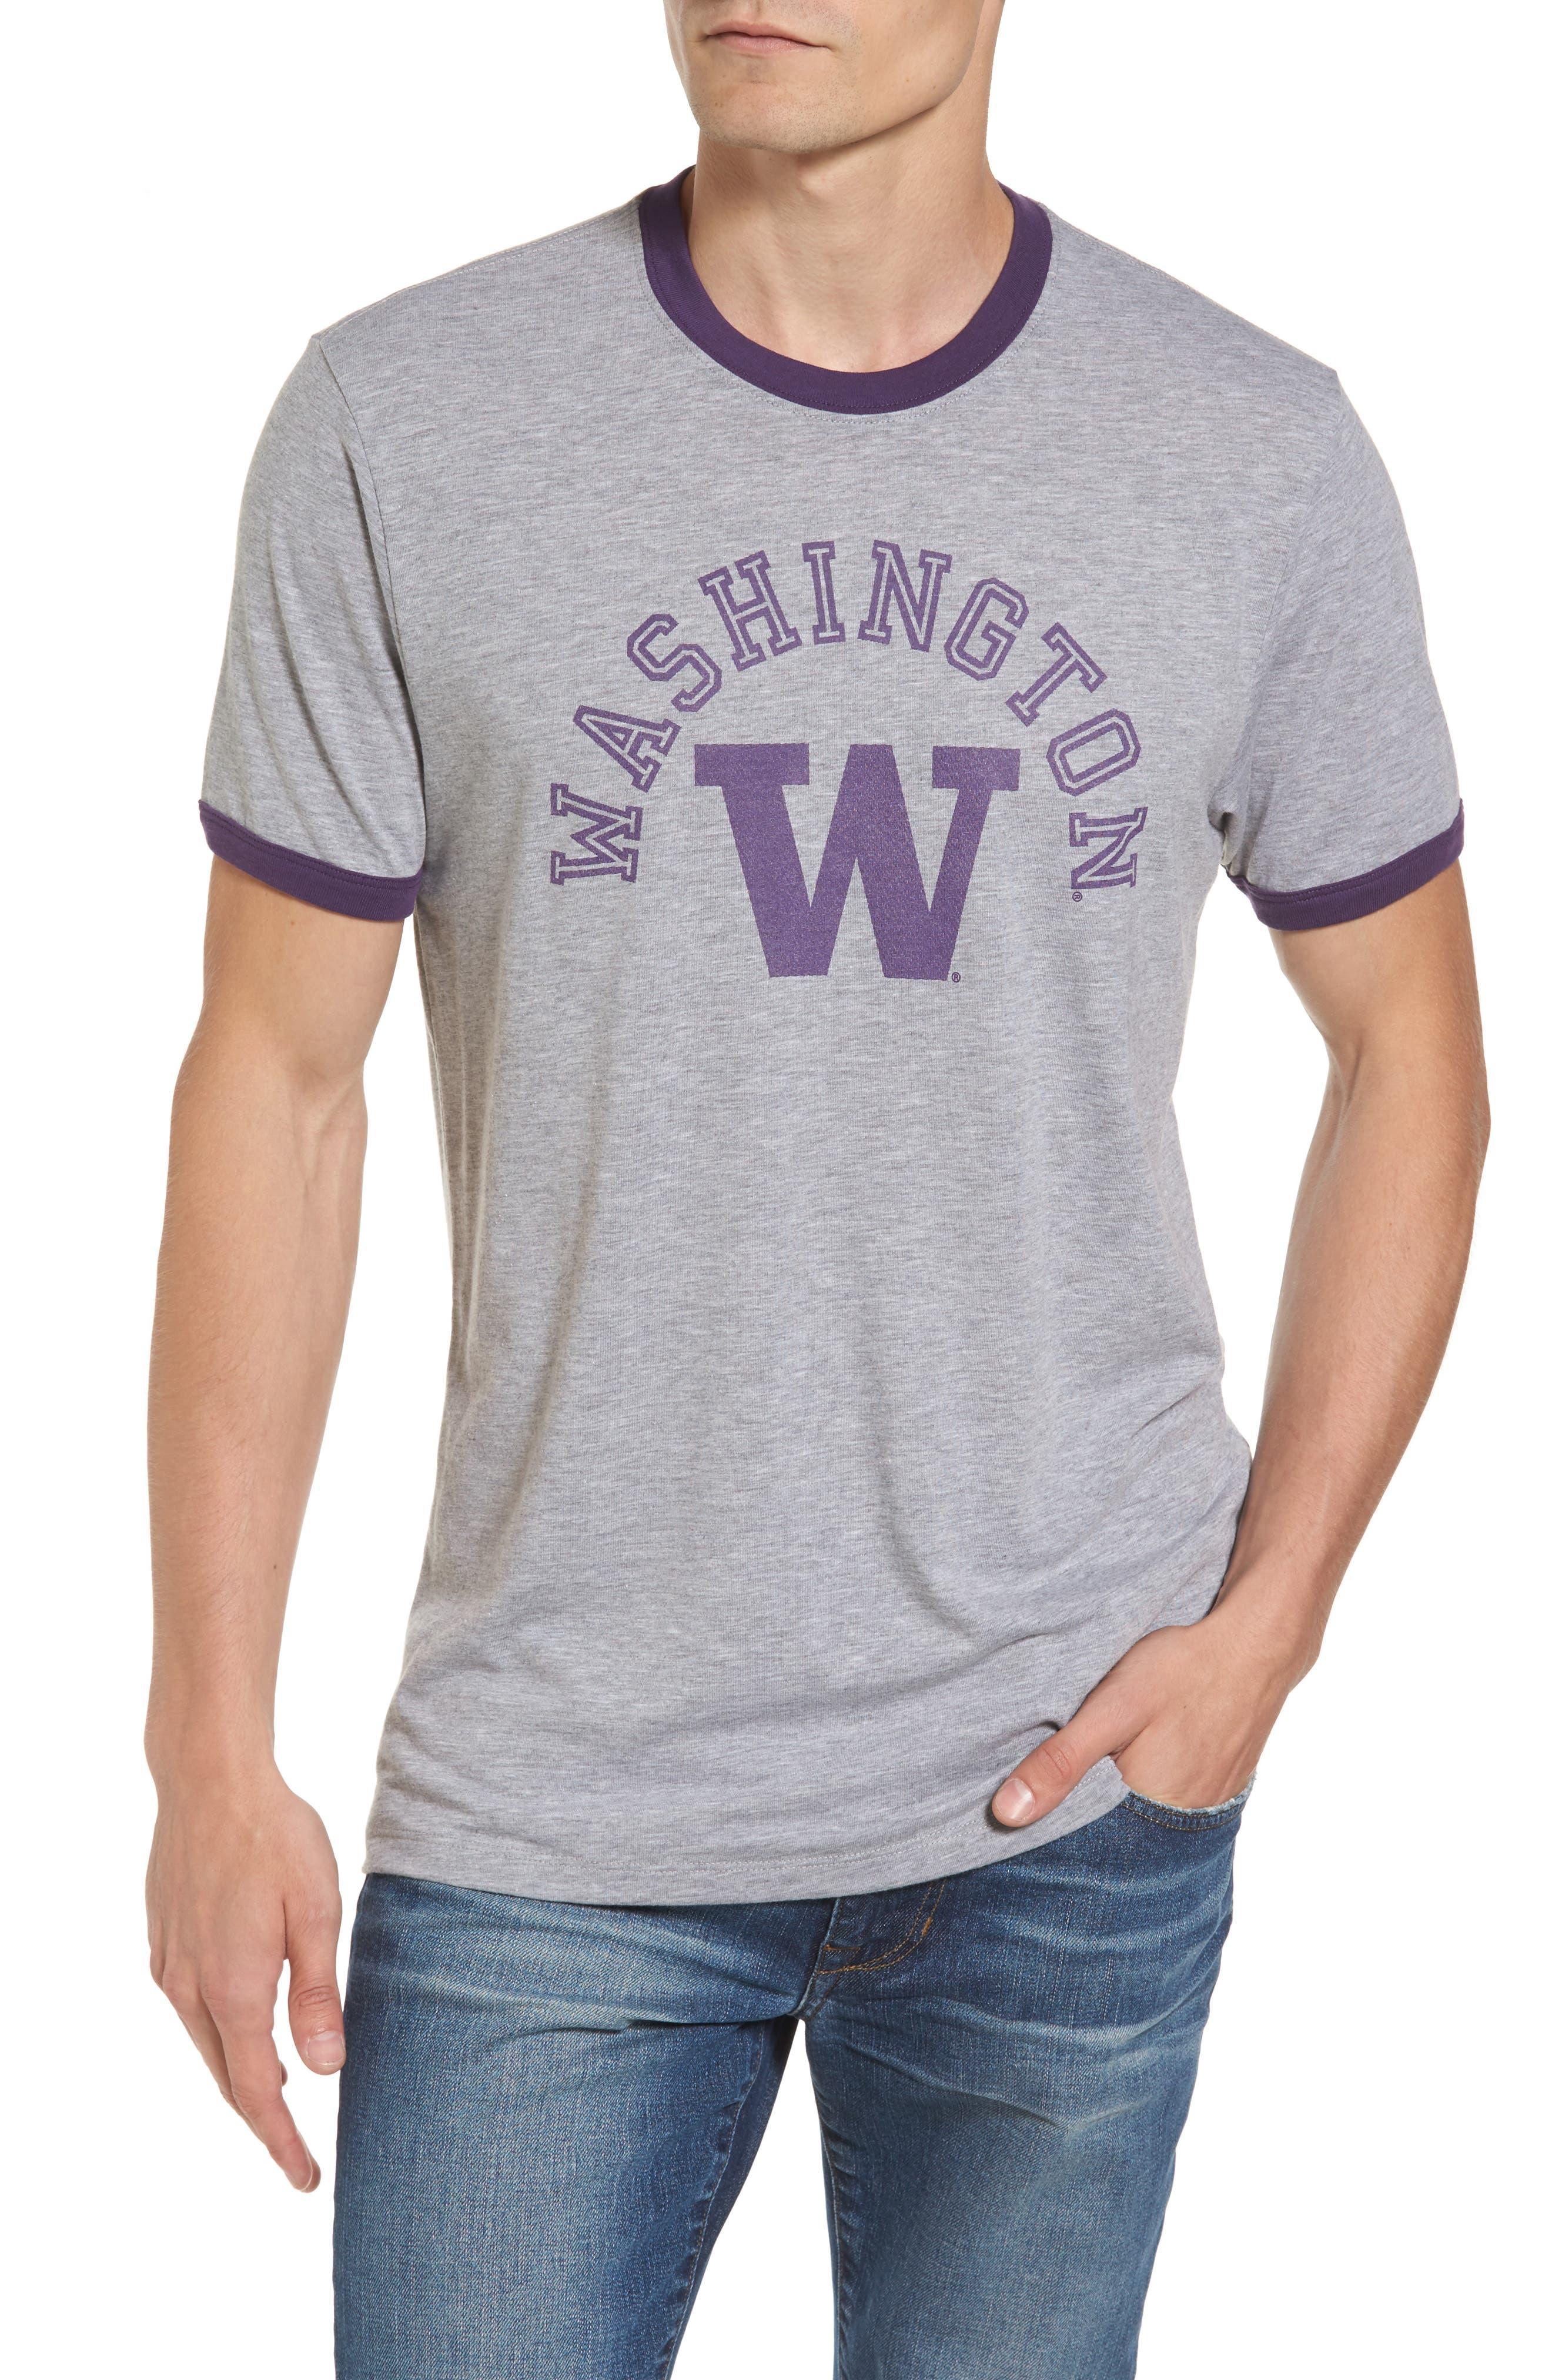 University of Washington Huskies Ringer T-Shirt,                             Main thumbnail 1, color,                             020